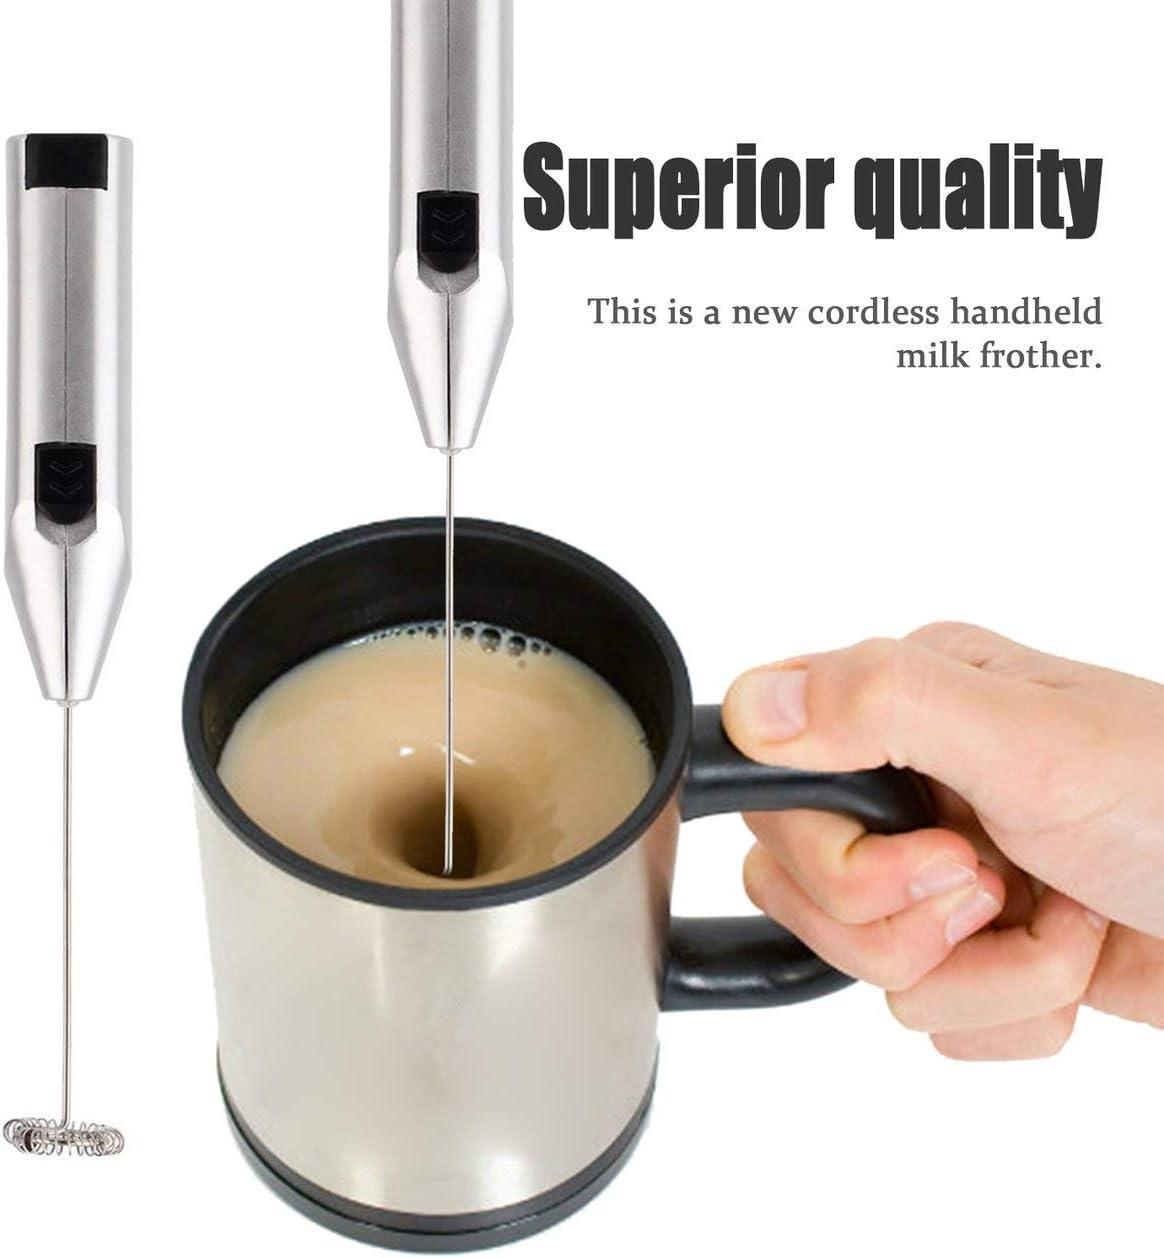 FGHJNXRFJN New Cordless Milk Frother Handheld Foamer Cappuccino Maker Latte Espresso Random